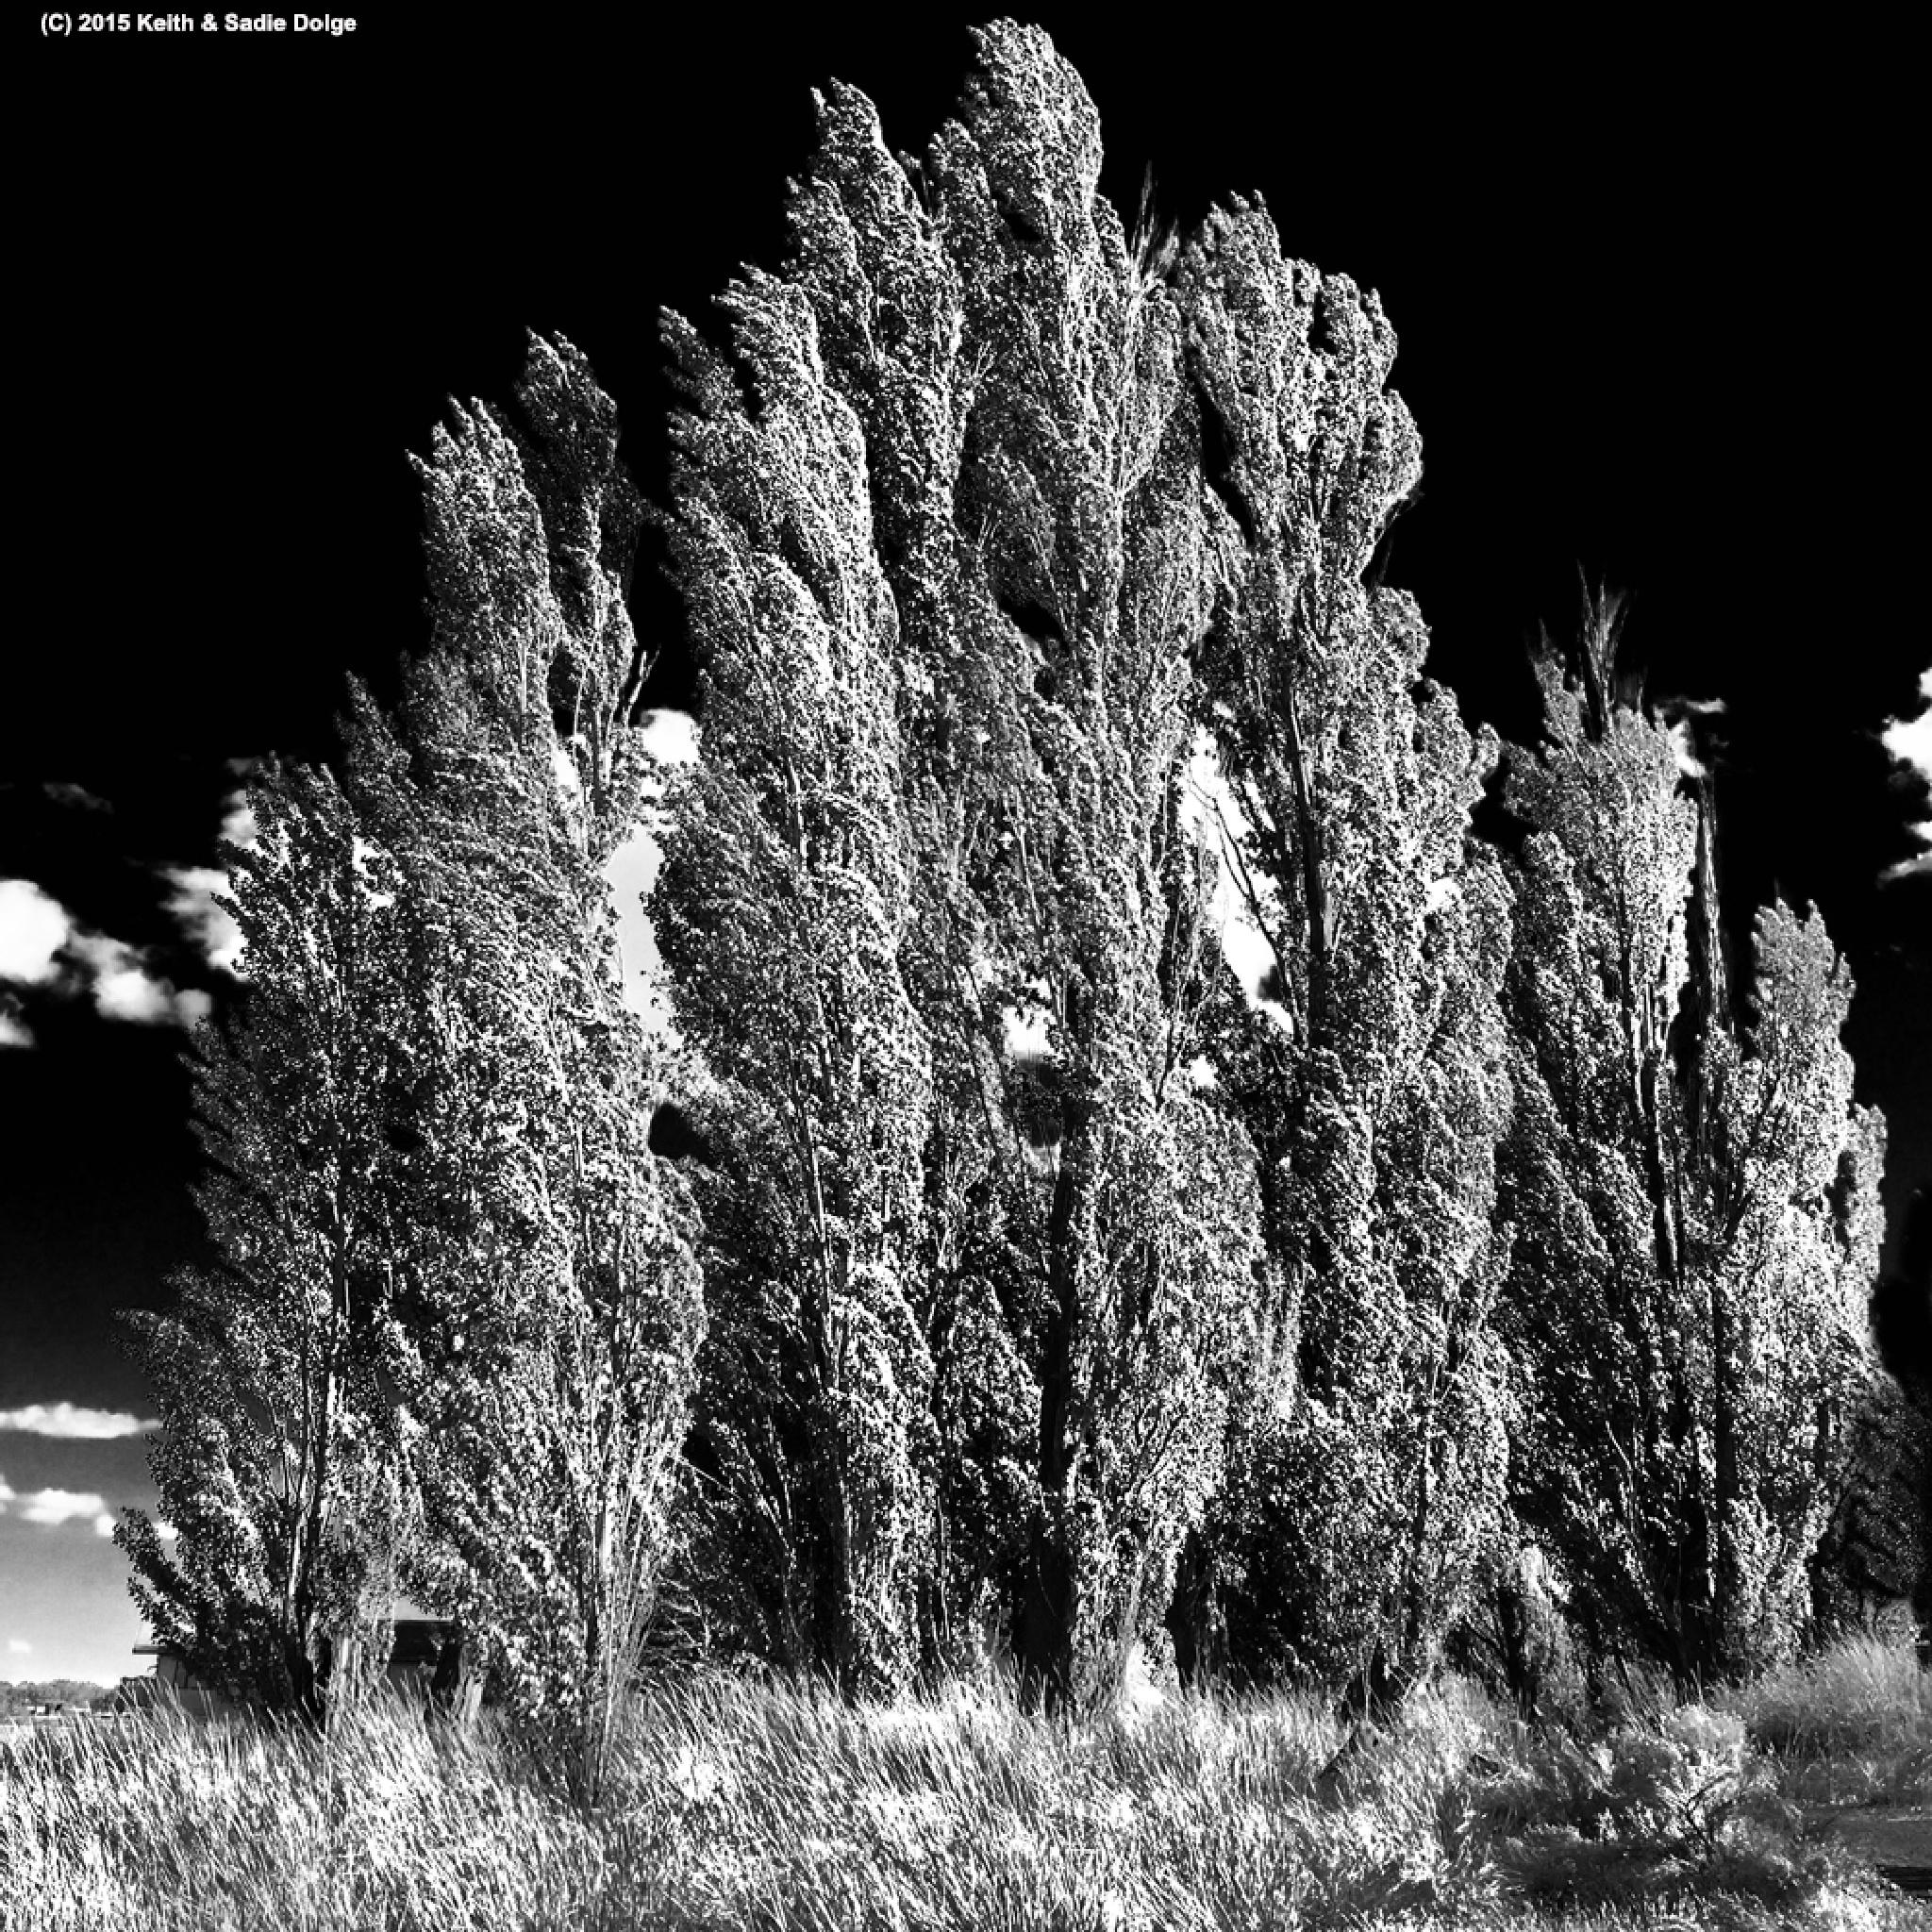 Poplars by KDolge